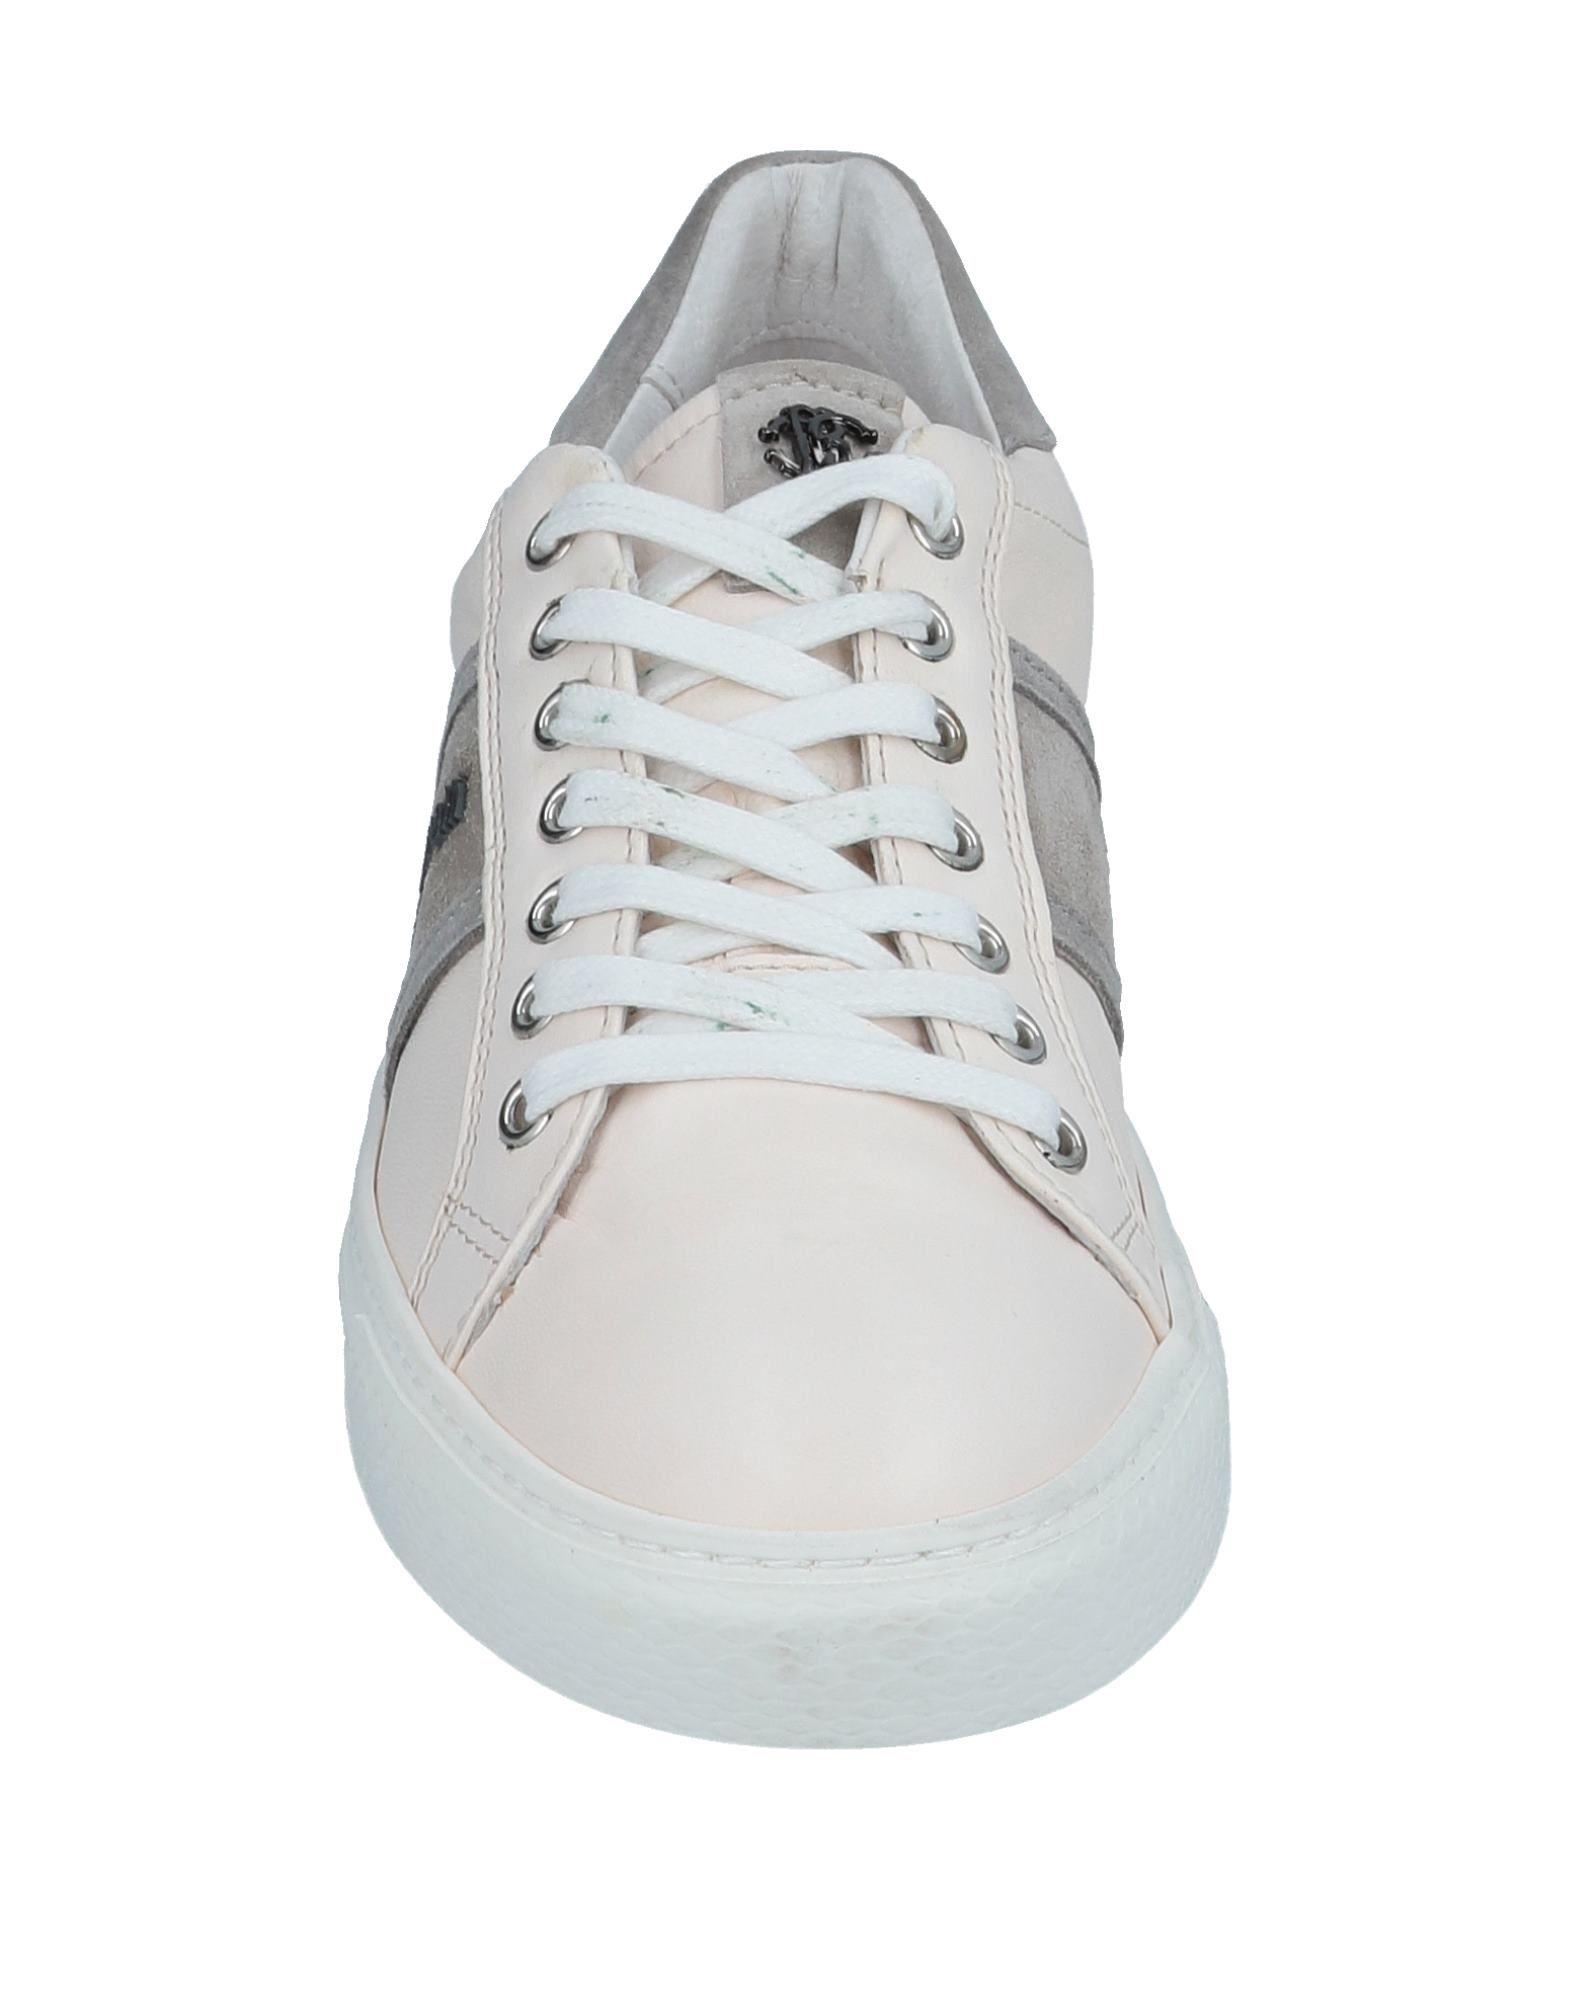 Roberto Cavalli Sneakers - Men Roberto Roberto Roberto Cavalli Sneakers online on  Canada - 44956864XP 7cc073